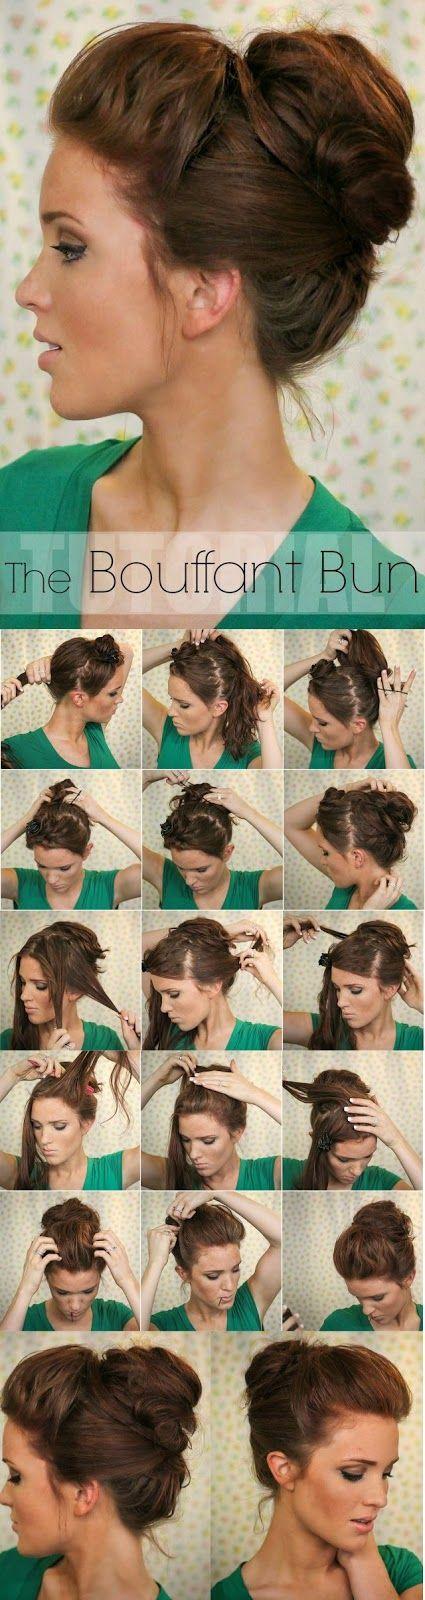 Miraculous 1000 Ideas About High Bun Hairstyles On Pinterest High Bun Bun Short Hairstyles For Black Women Fulllsitofus